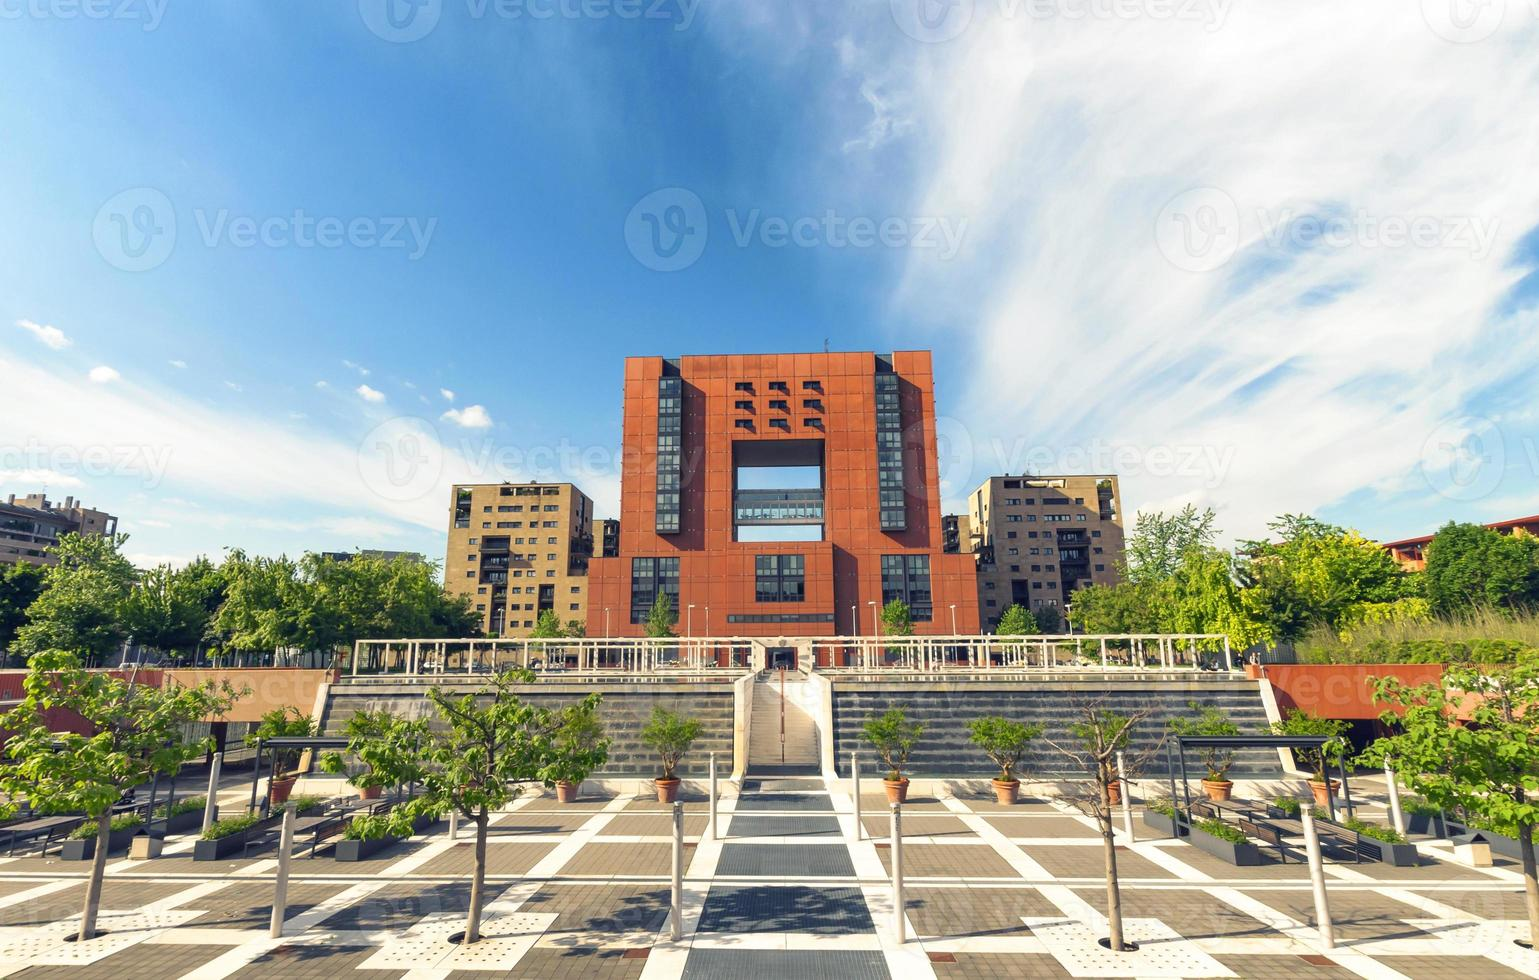 bicocca universitet, milan italy foto